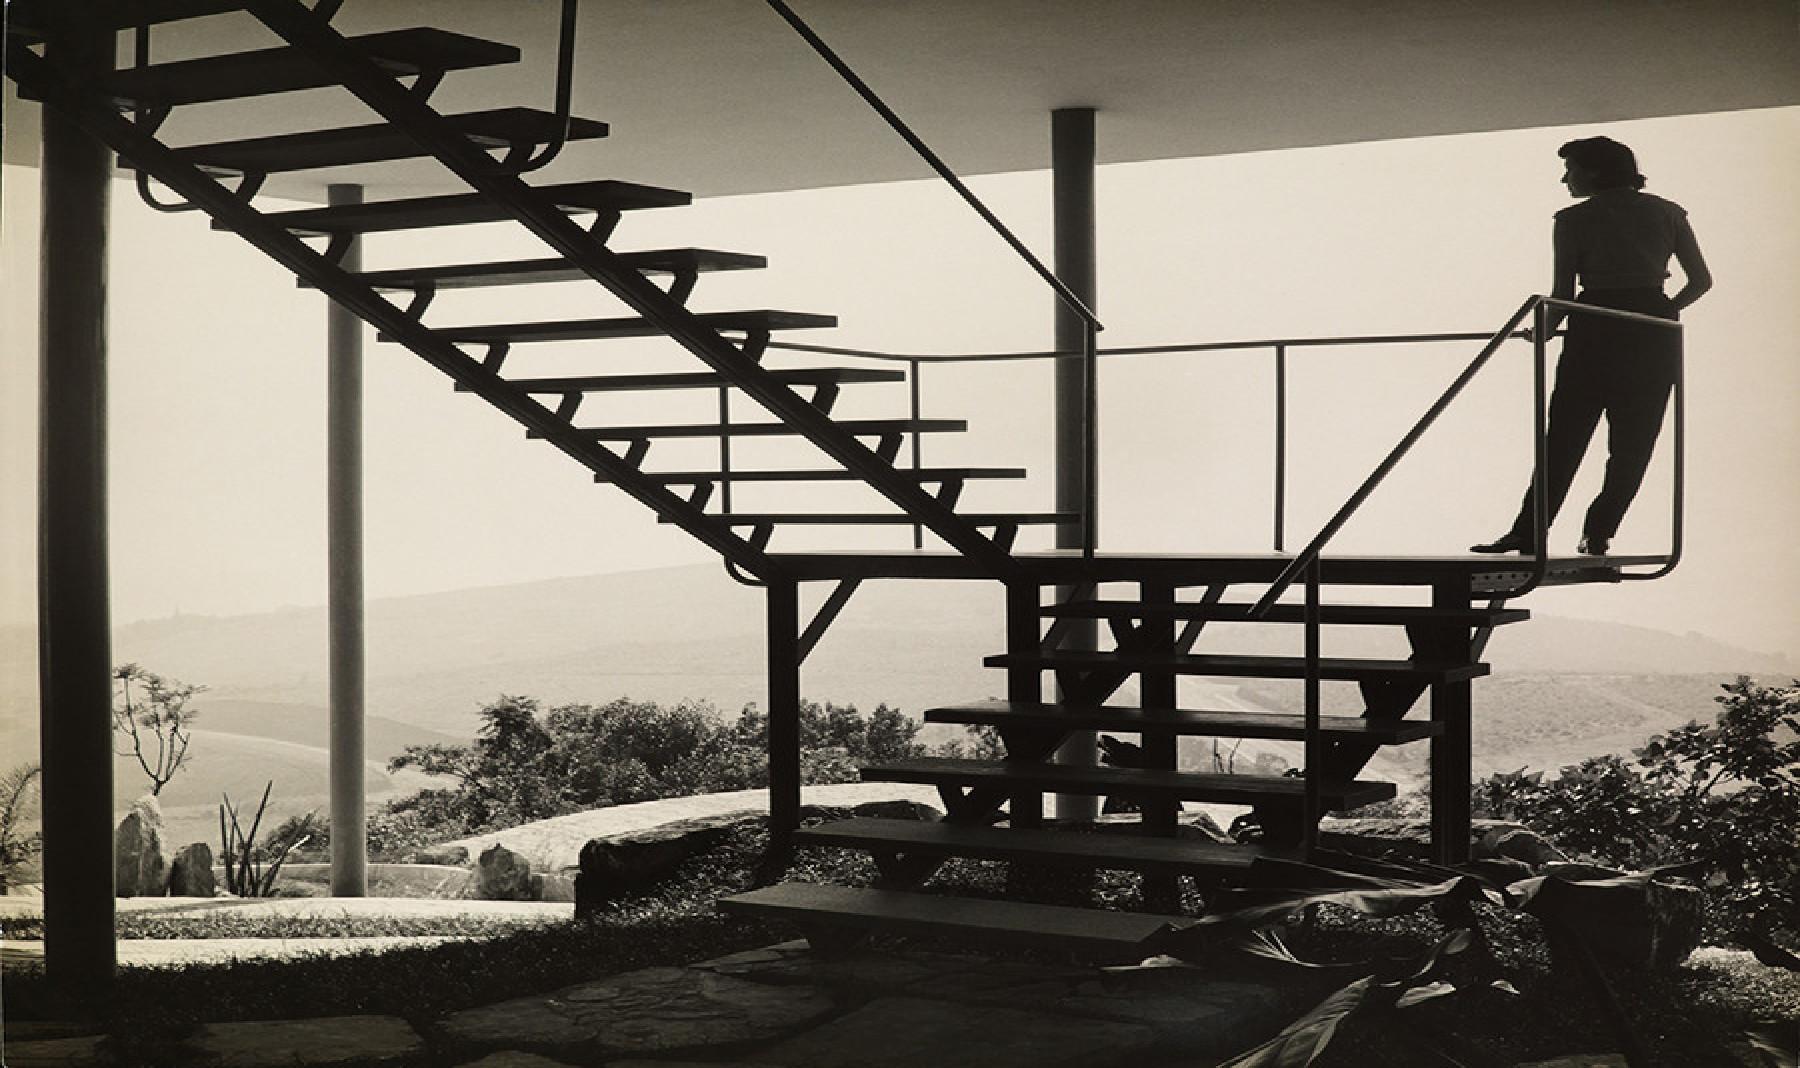 1030c1847 Exhibition: Lina Bo Bardi 100 Brazil's Alternative Path to Modernism ...